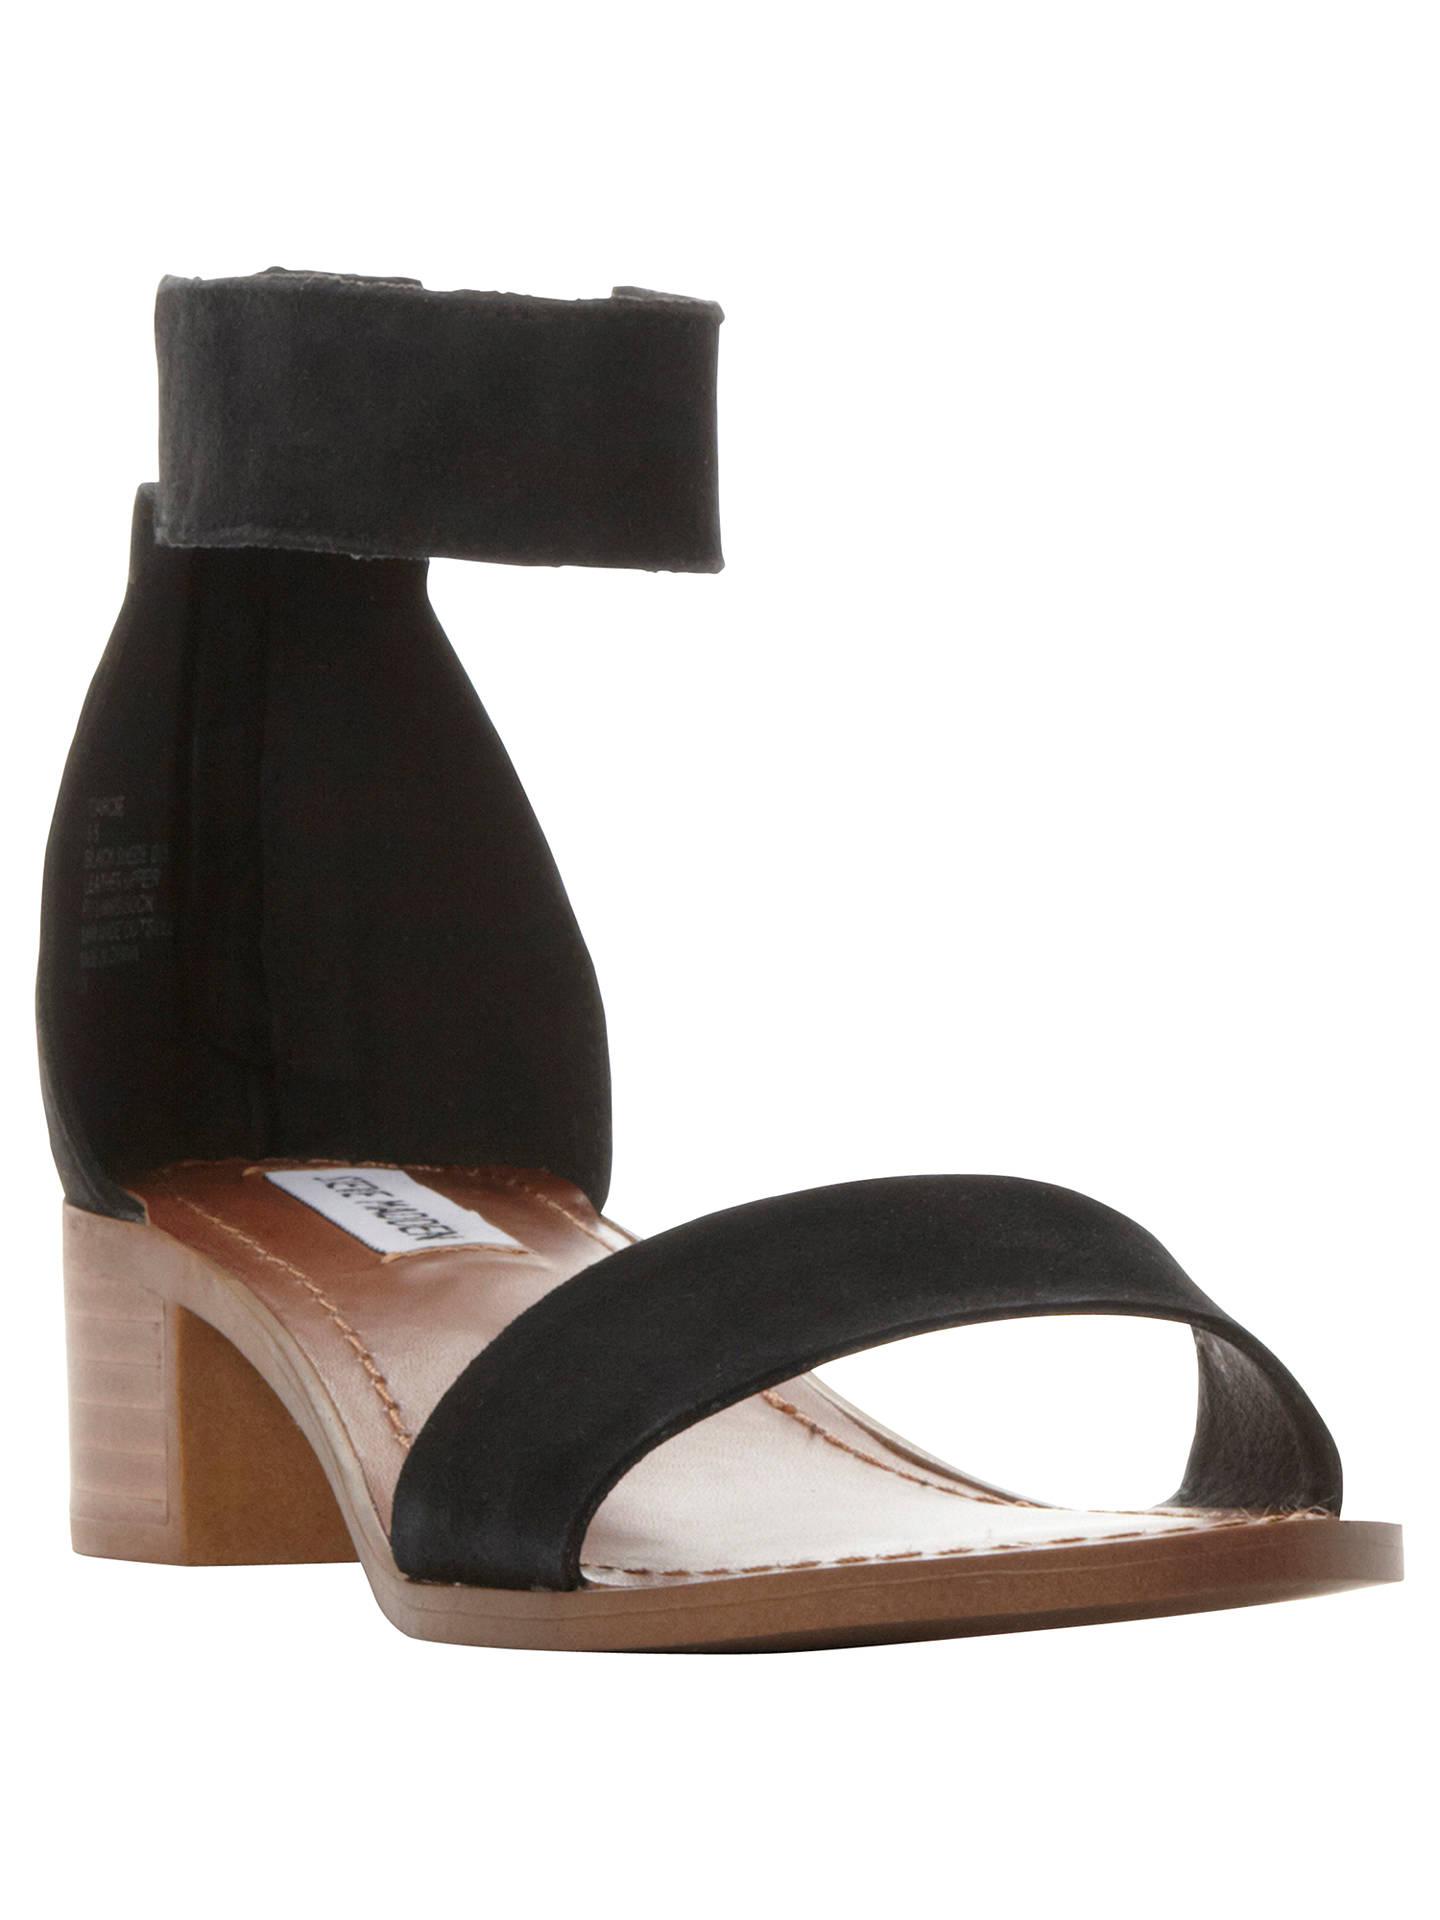 85653293b Buy Steve Madden Darcie Block Heeled Sandals, Black Suede, 3 Online at  johnlewis.